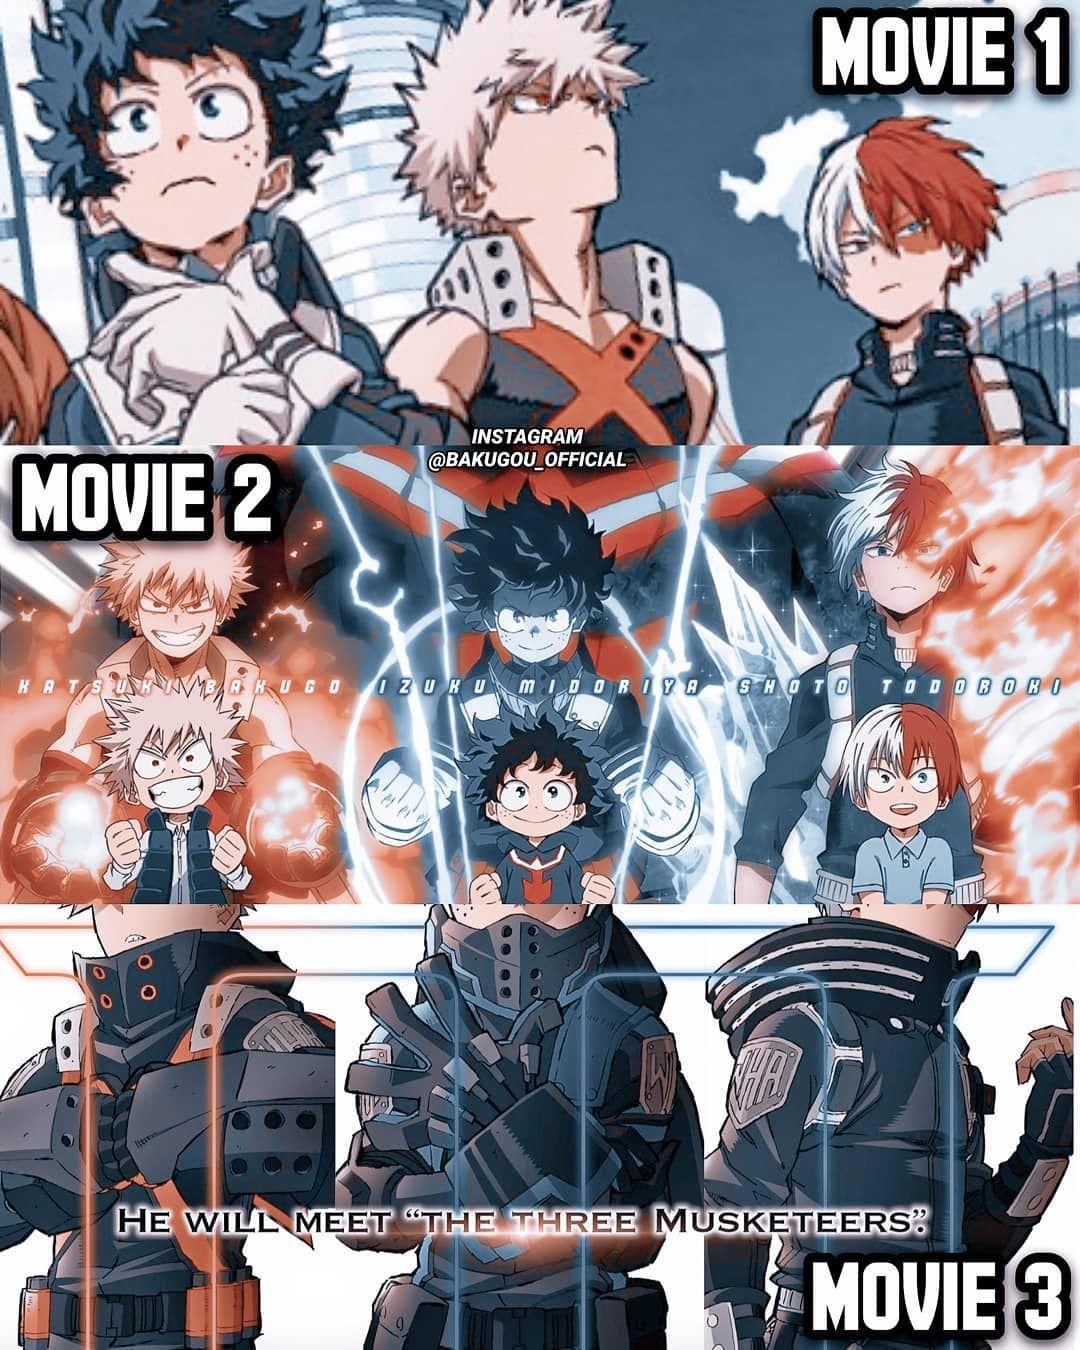 Mi Piace 139 Commenti 9 Bakugou Katsuki M W Laura Bakugou Official Su Instagra My Hero Academia Episodes Anime Characters Hottest Anime Characters